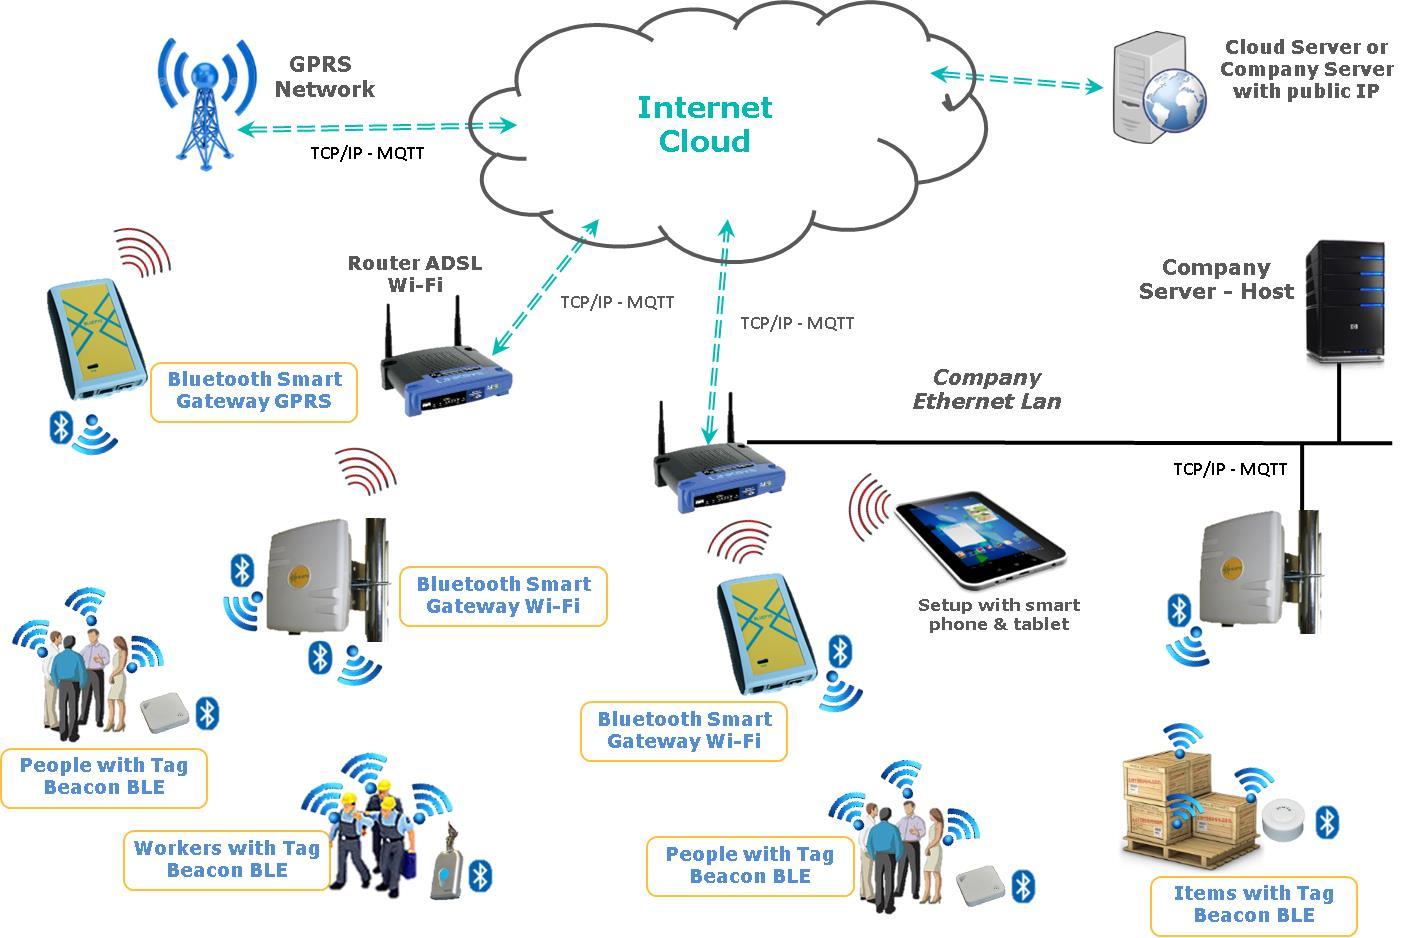 Bluepyc Ble Industrial Gateway Ethernet Lan Diagram Dataflow Scenario